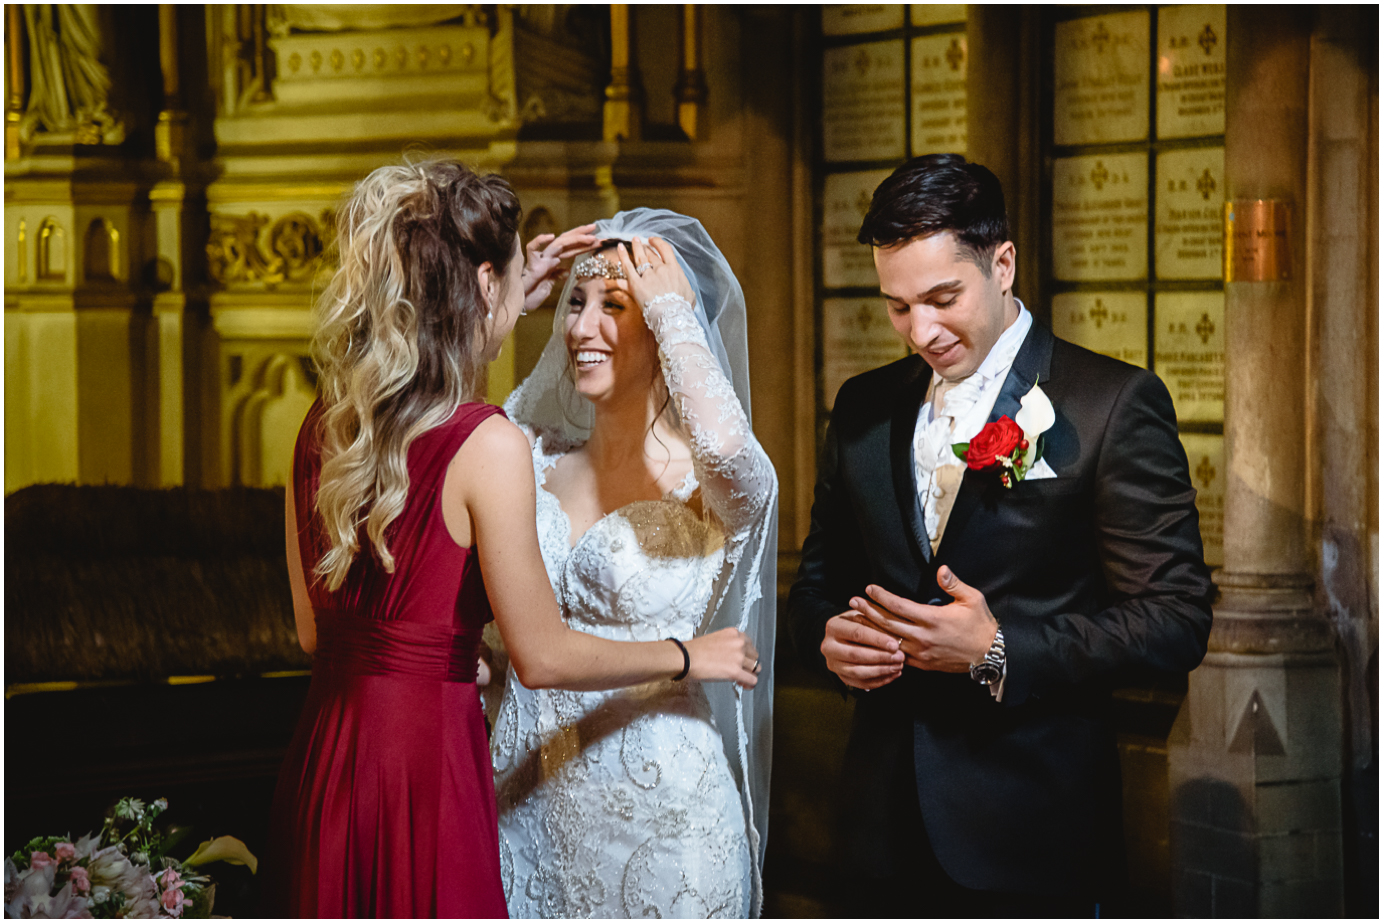 iranian wedding photographer 90 - Drapers Hall London Wedding Photographer